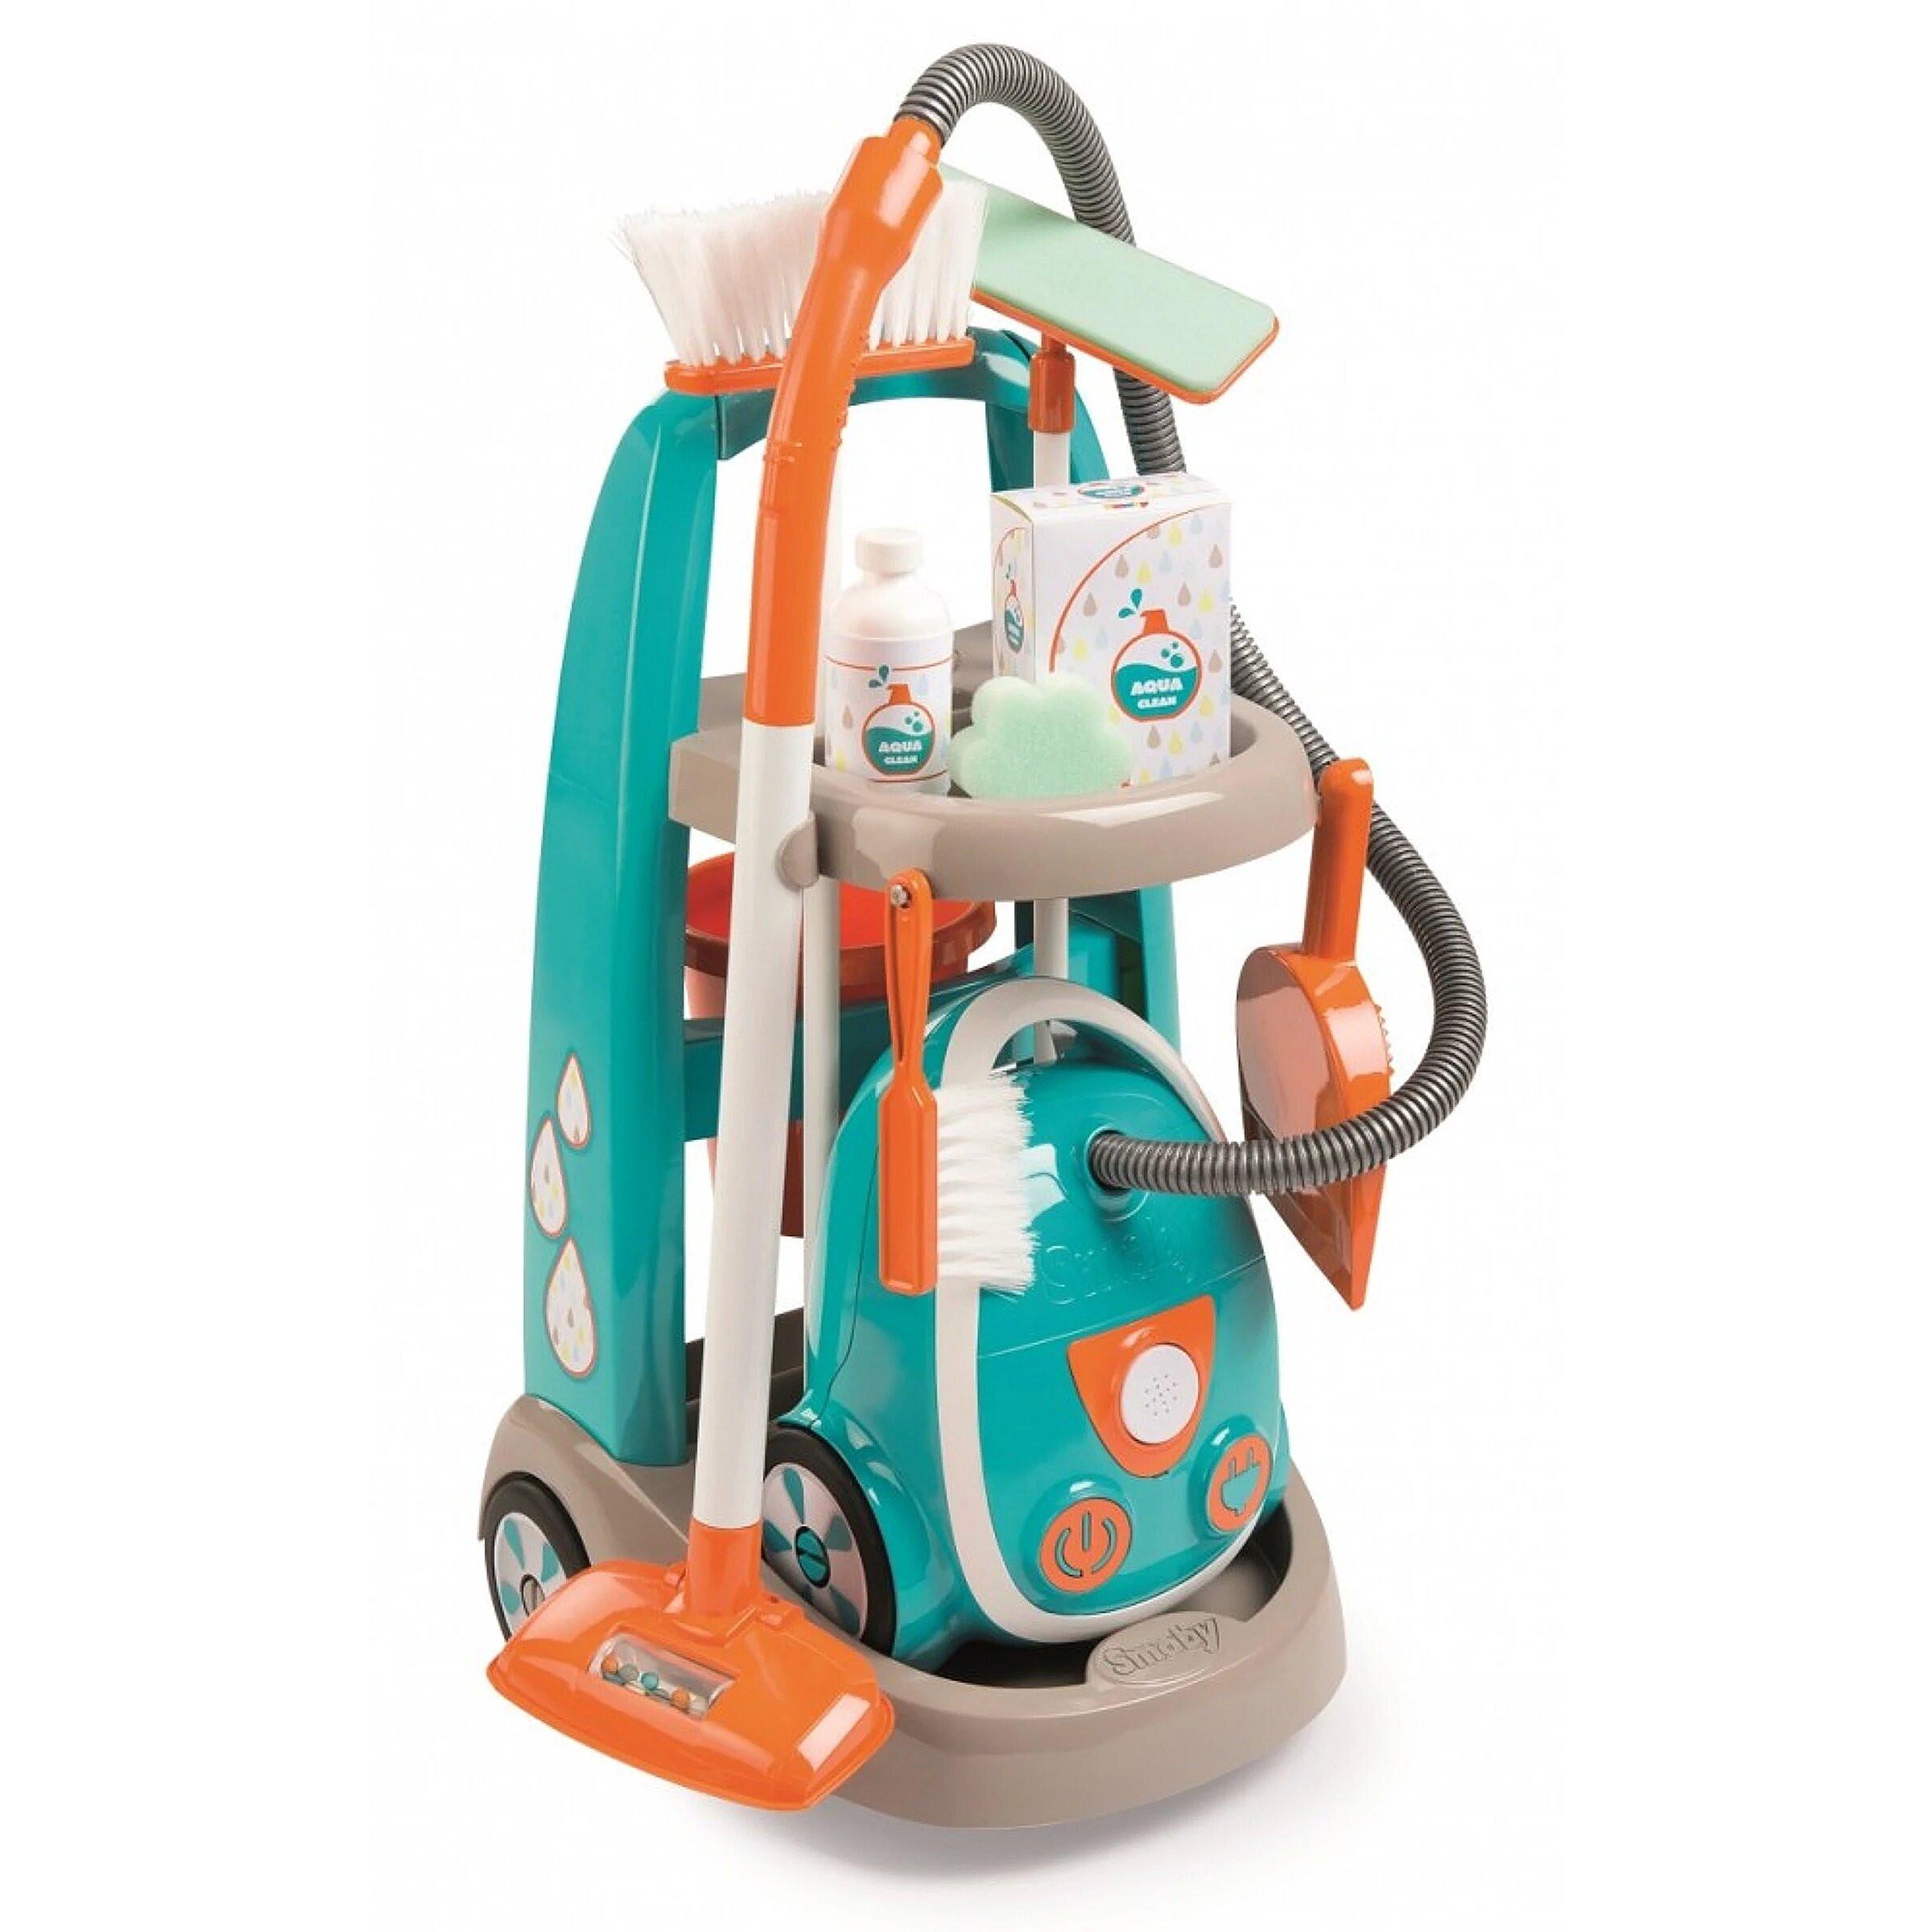 Smoby - Chariot de ménage avec aspirateur